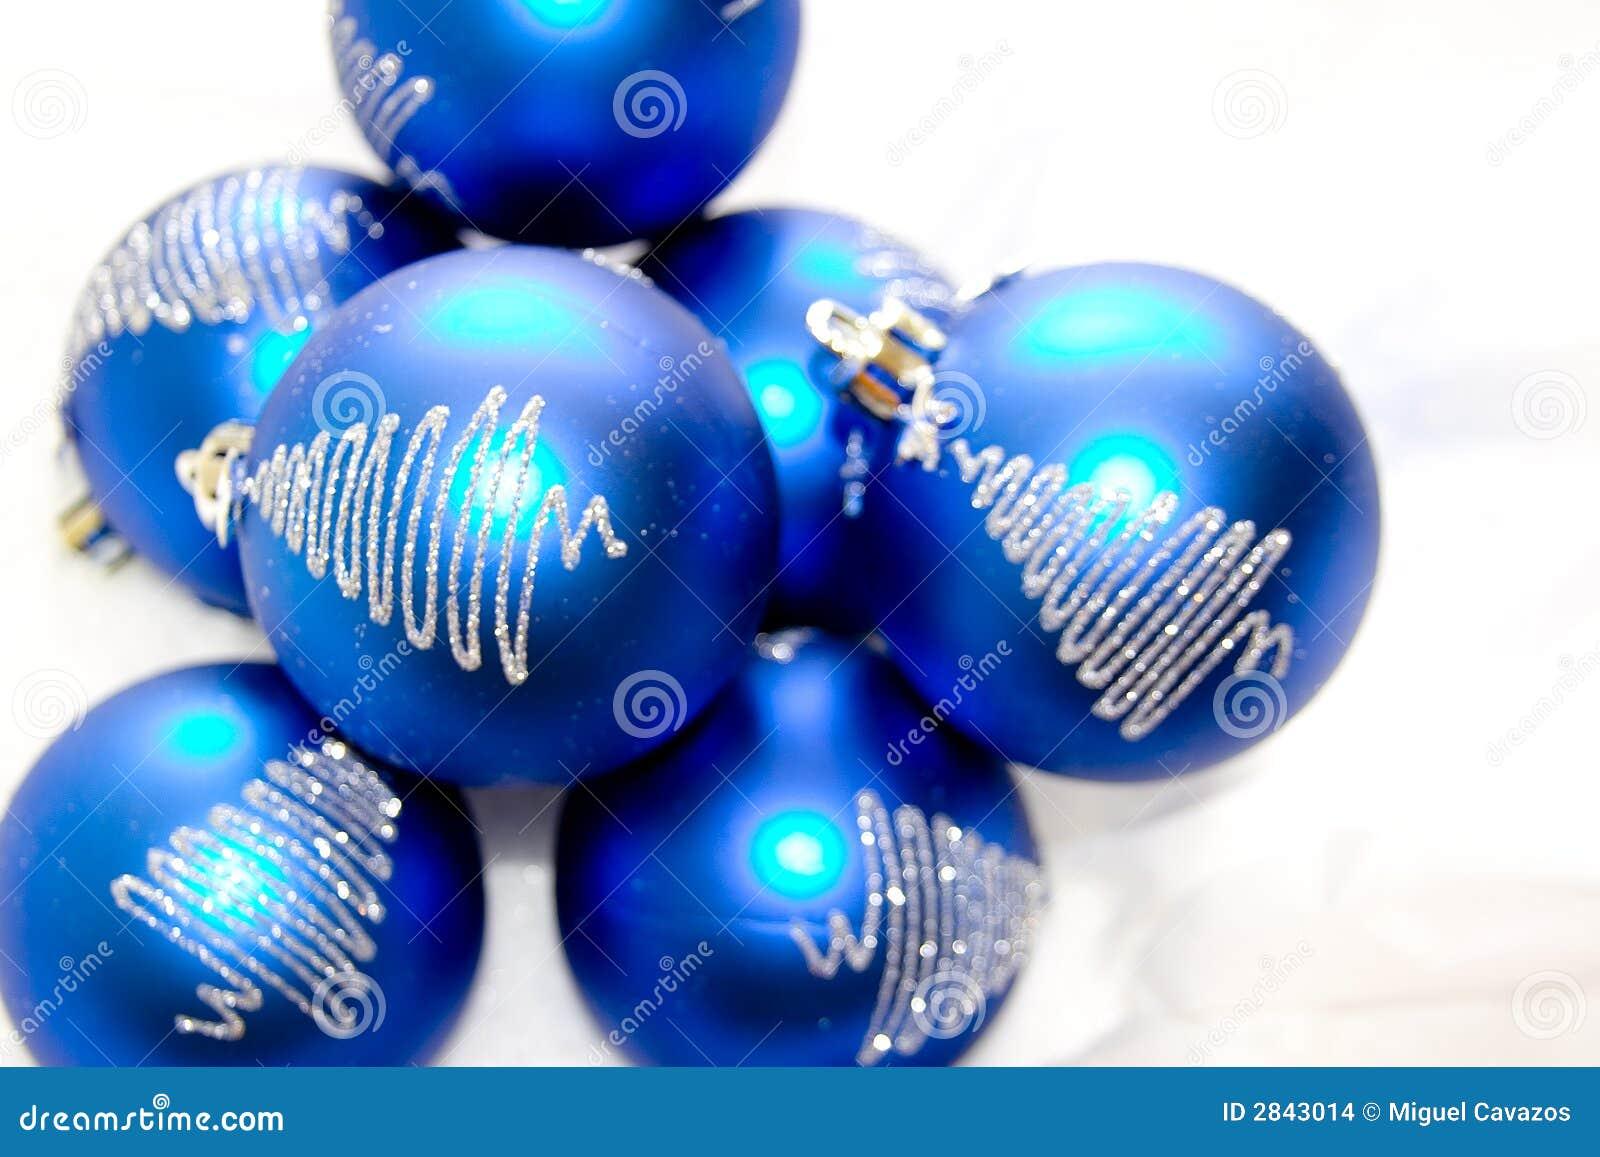 Glass xmas ornaments - Blue Christmas Glass Ornaments